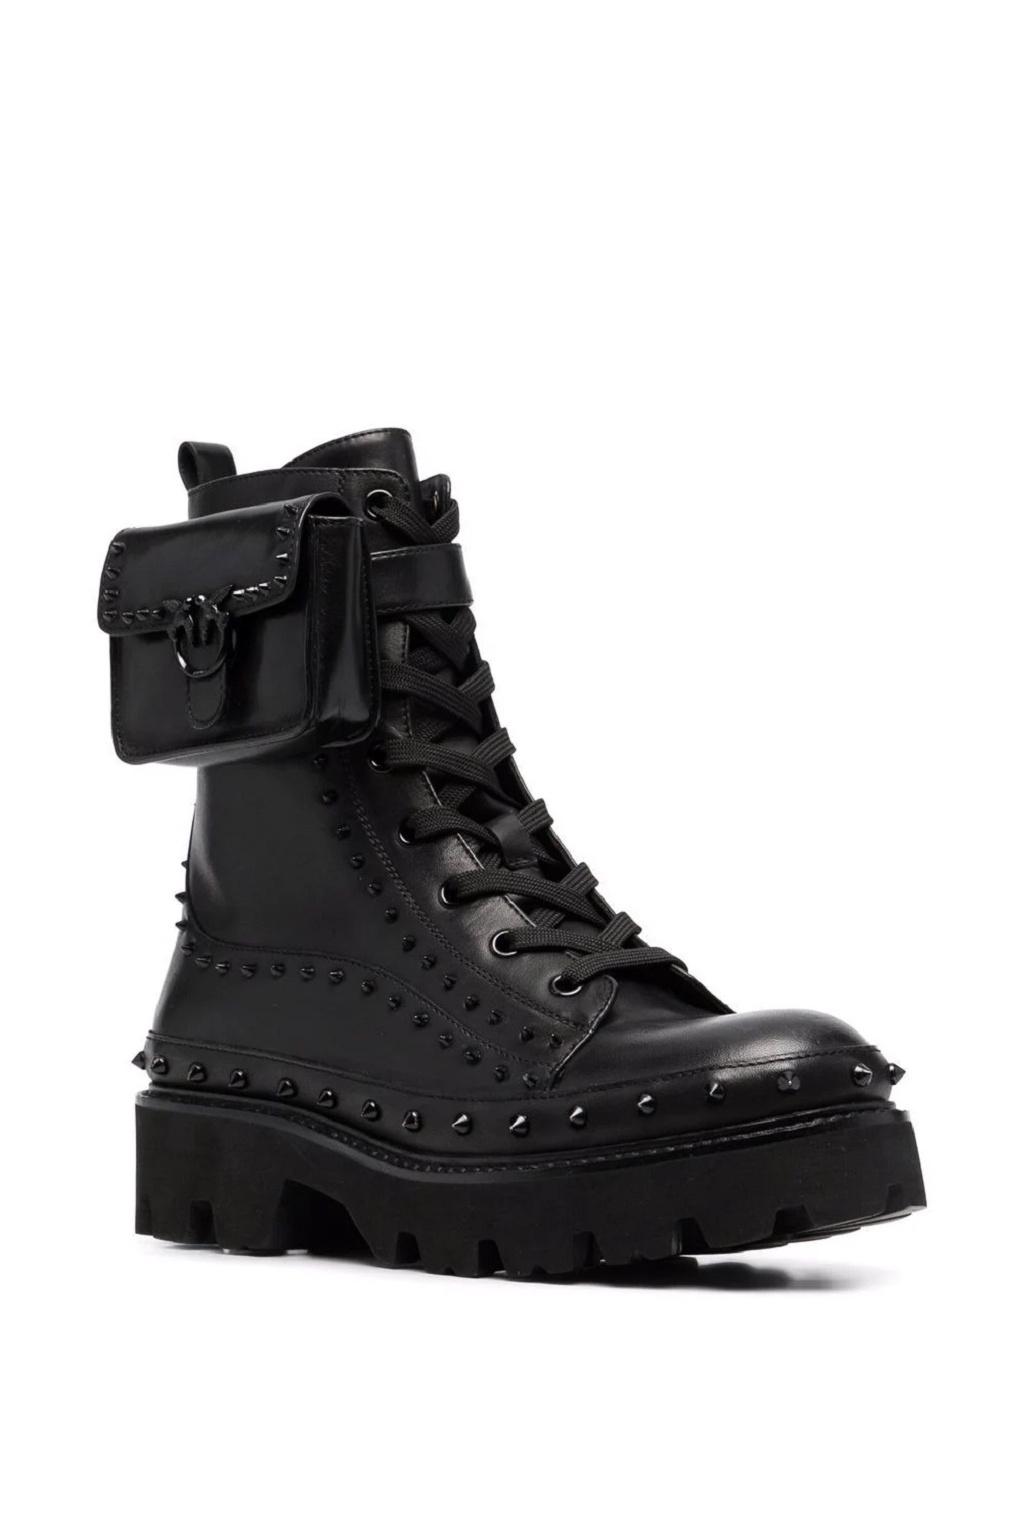 Dámská obuv Pinko Salvador černá